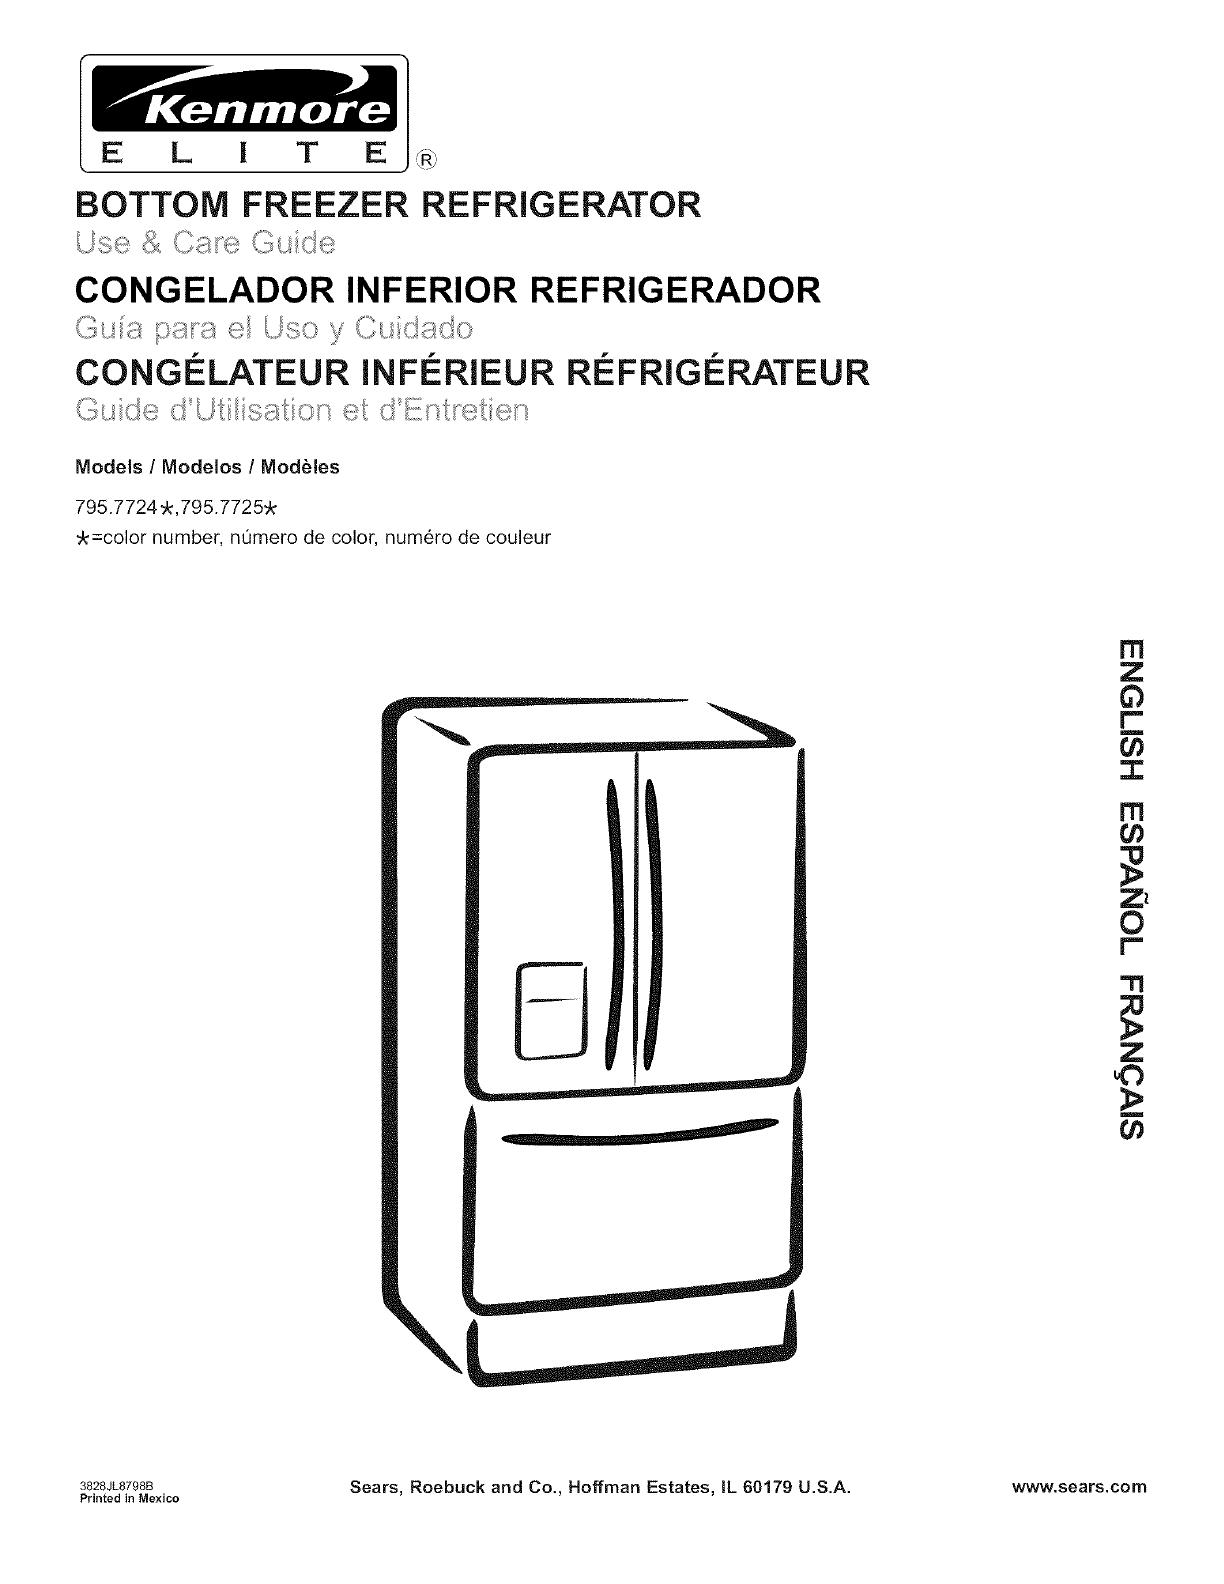 Kenmore Elite 79577563600 Bottom Mount Refrigerator Parts Sears Partsdirect